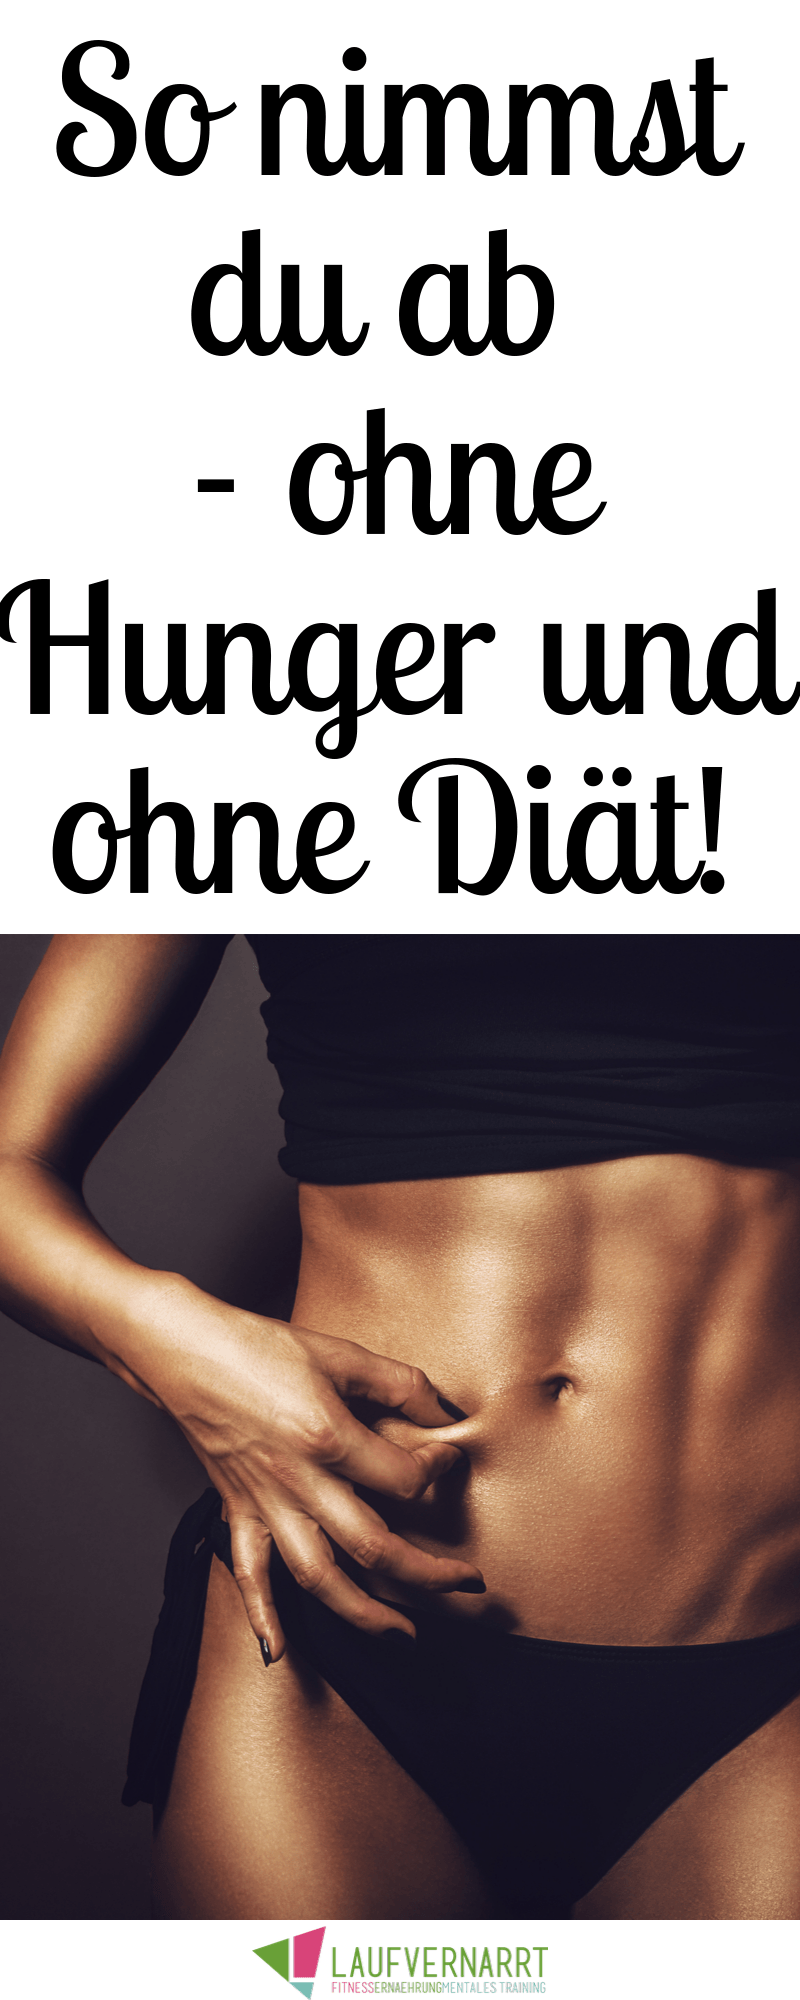 Abnehmen ohne Hunger - so geht's - Laufvernarrt